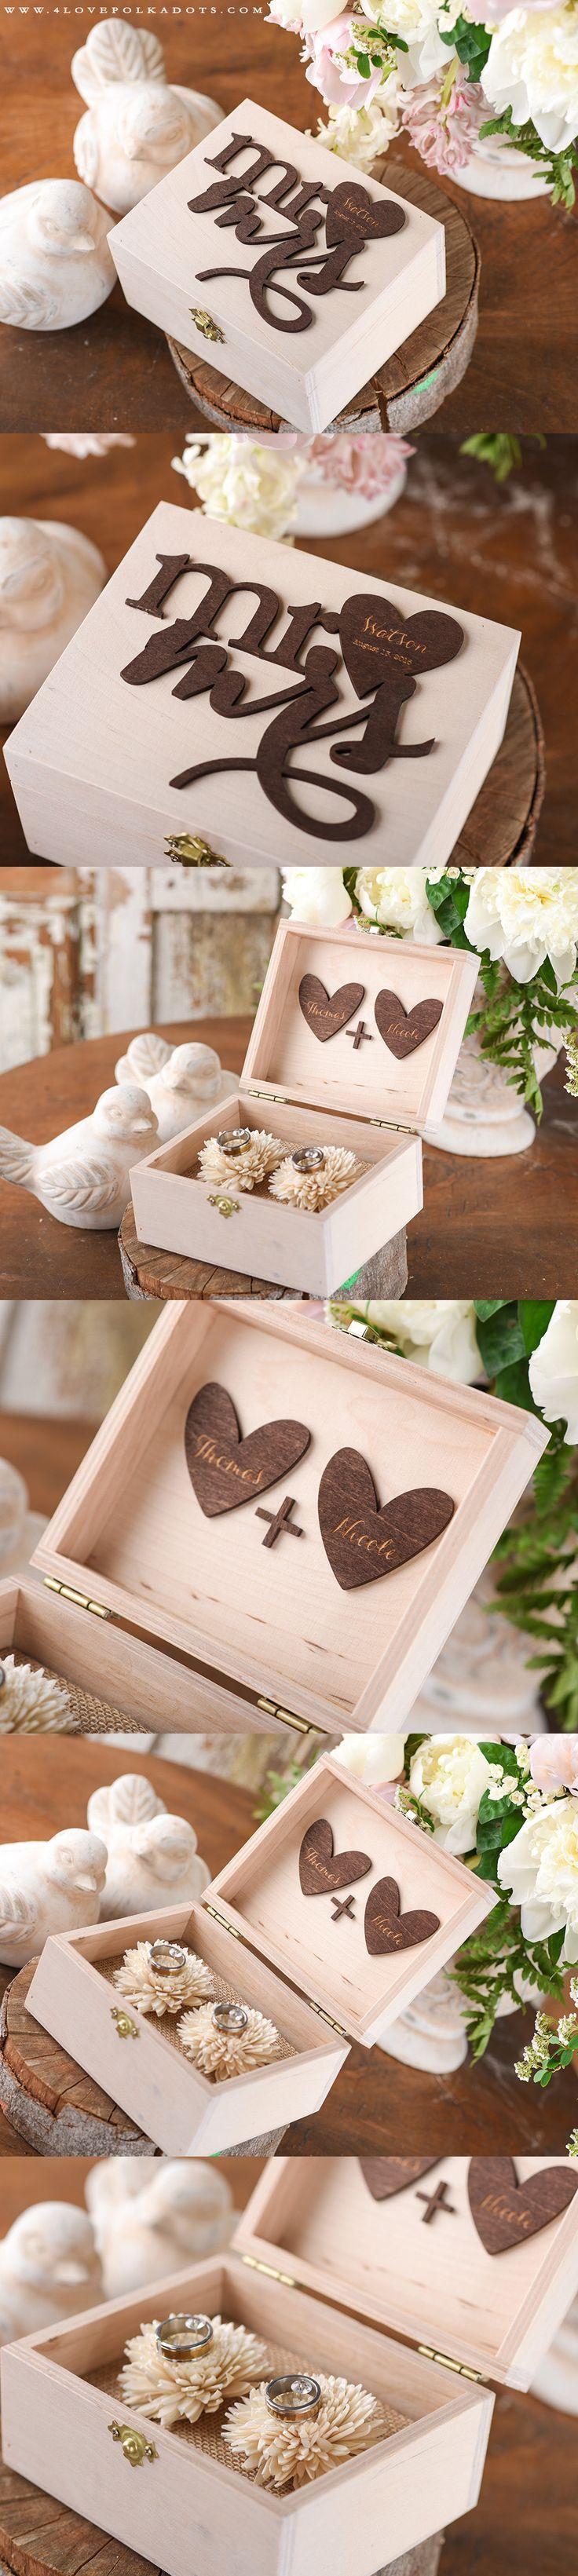 Mr & Mrs Wedding Wooden Ring Box with Your engraving #realwood #summerwedding #weddingideas